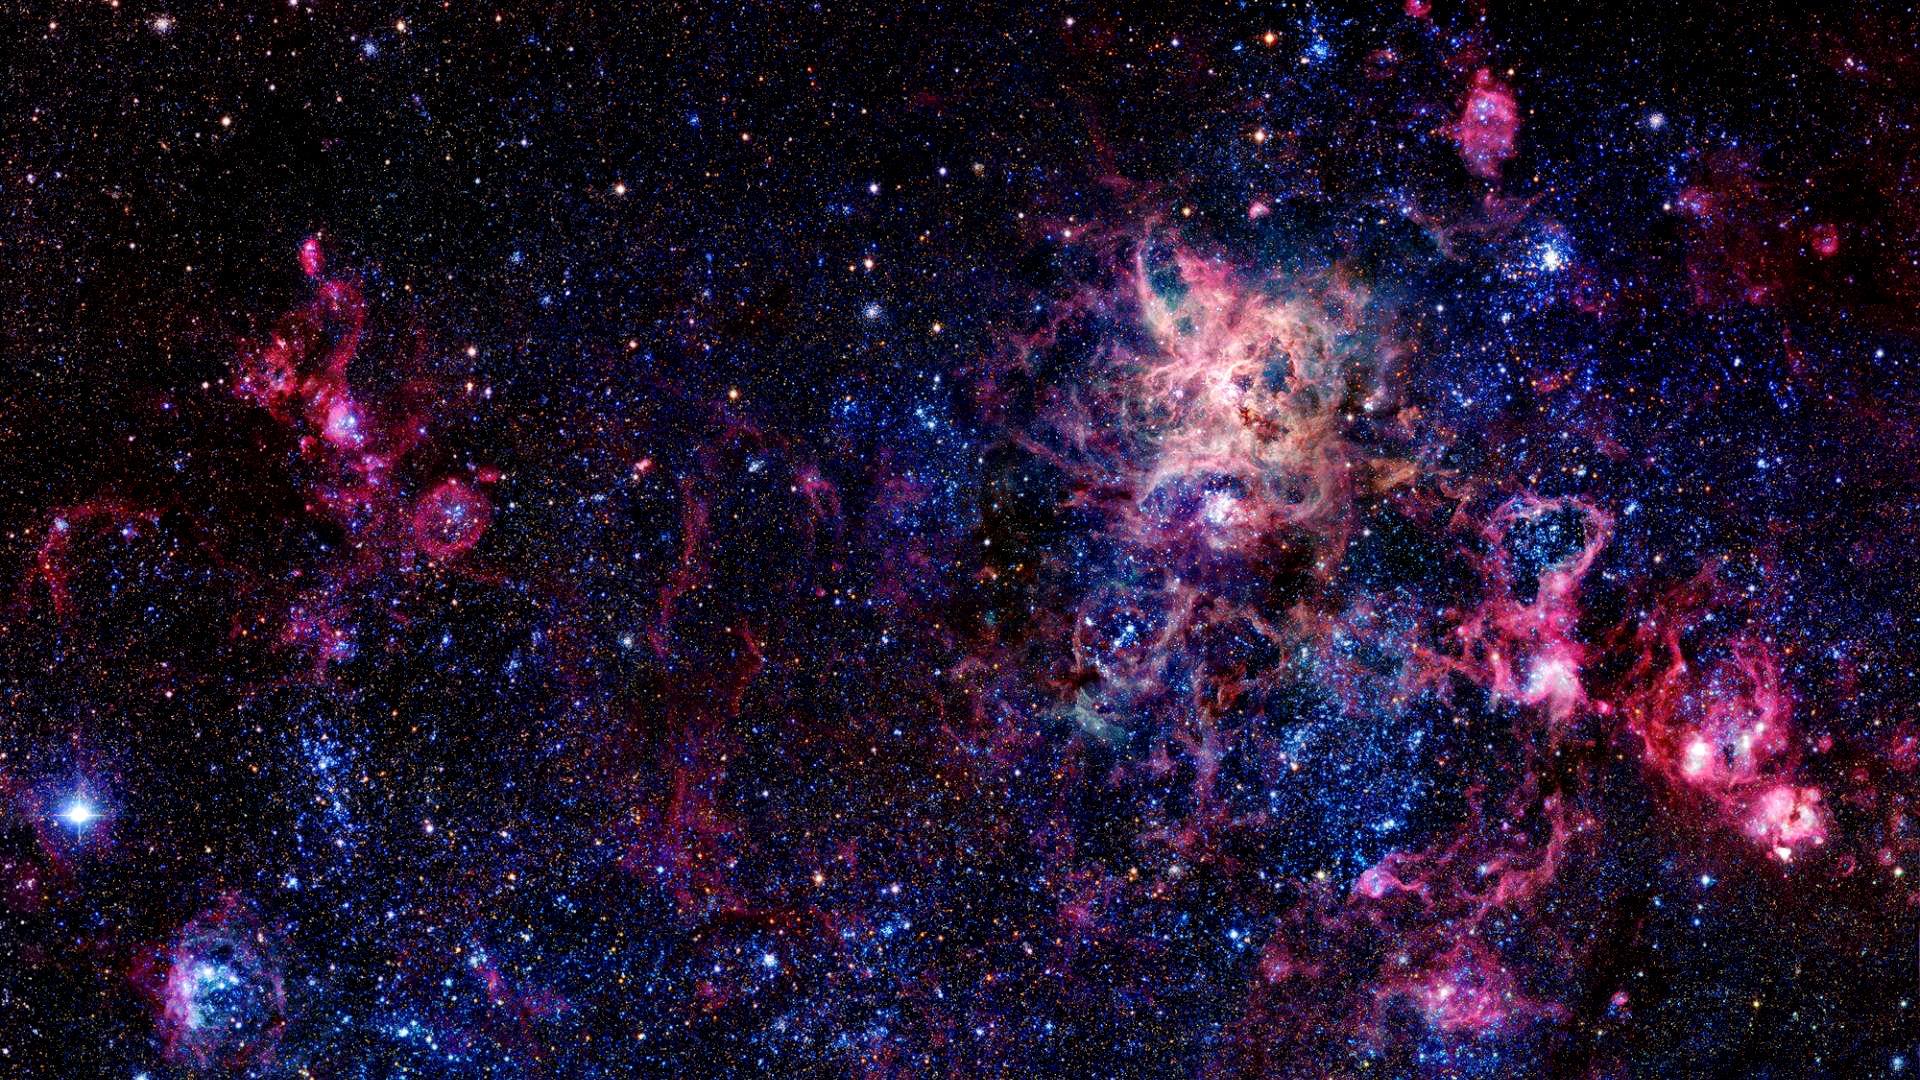 Mobile Hd Wallpapers Quotes Desktop Nebula Hd Wallpapers Pixelstalk Net